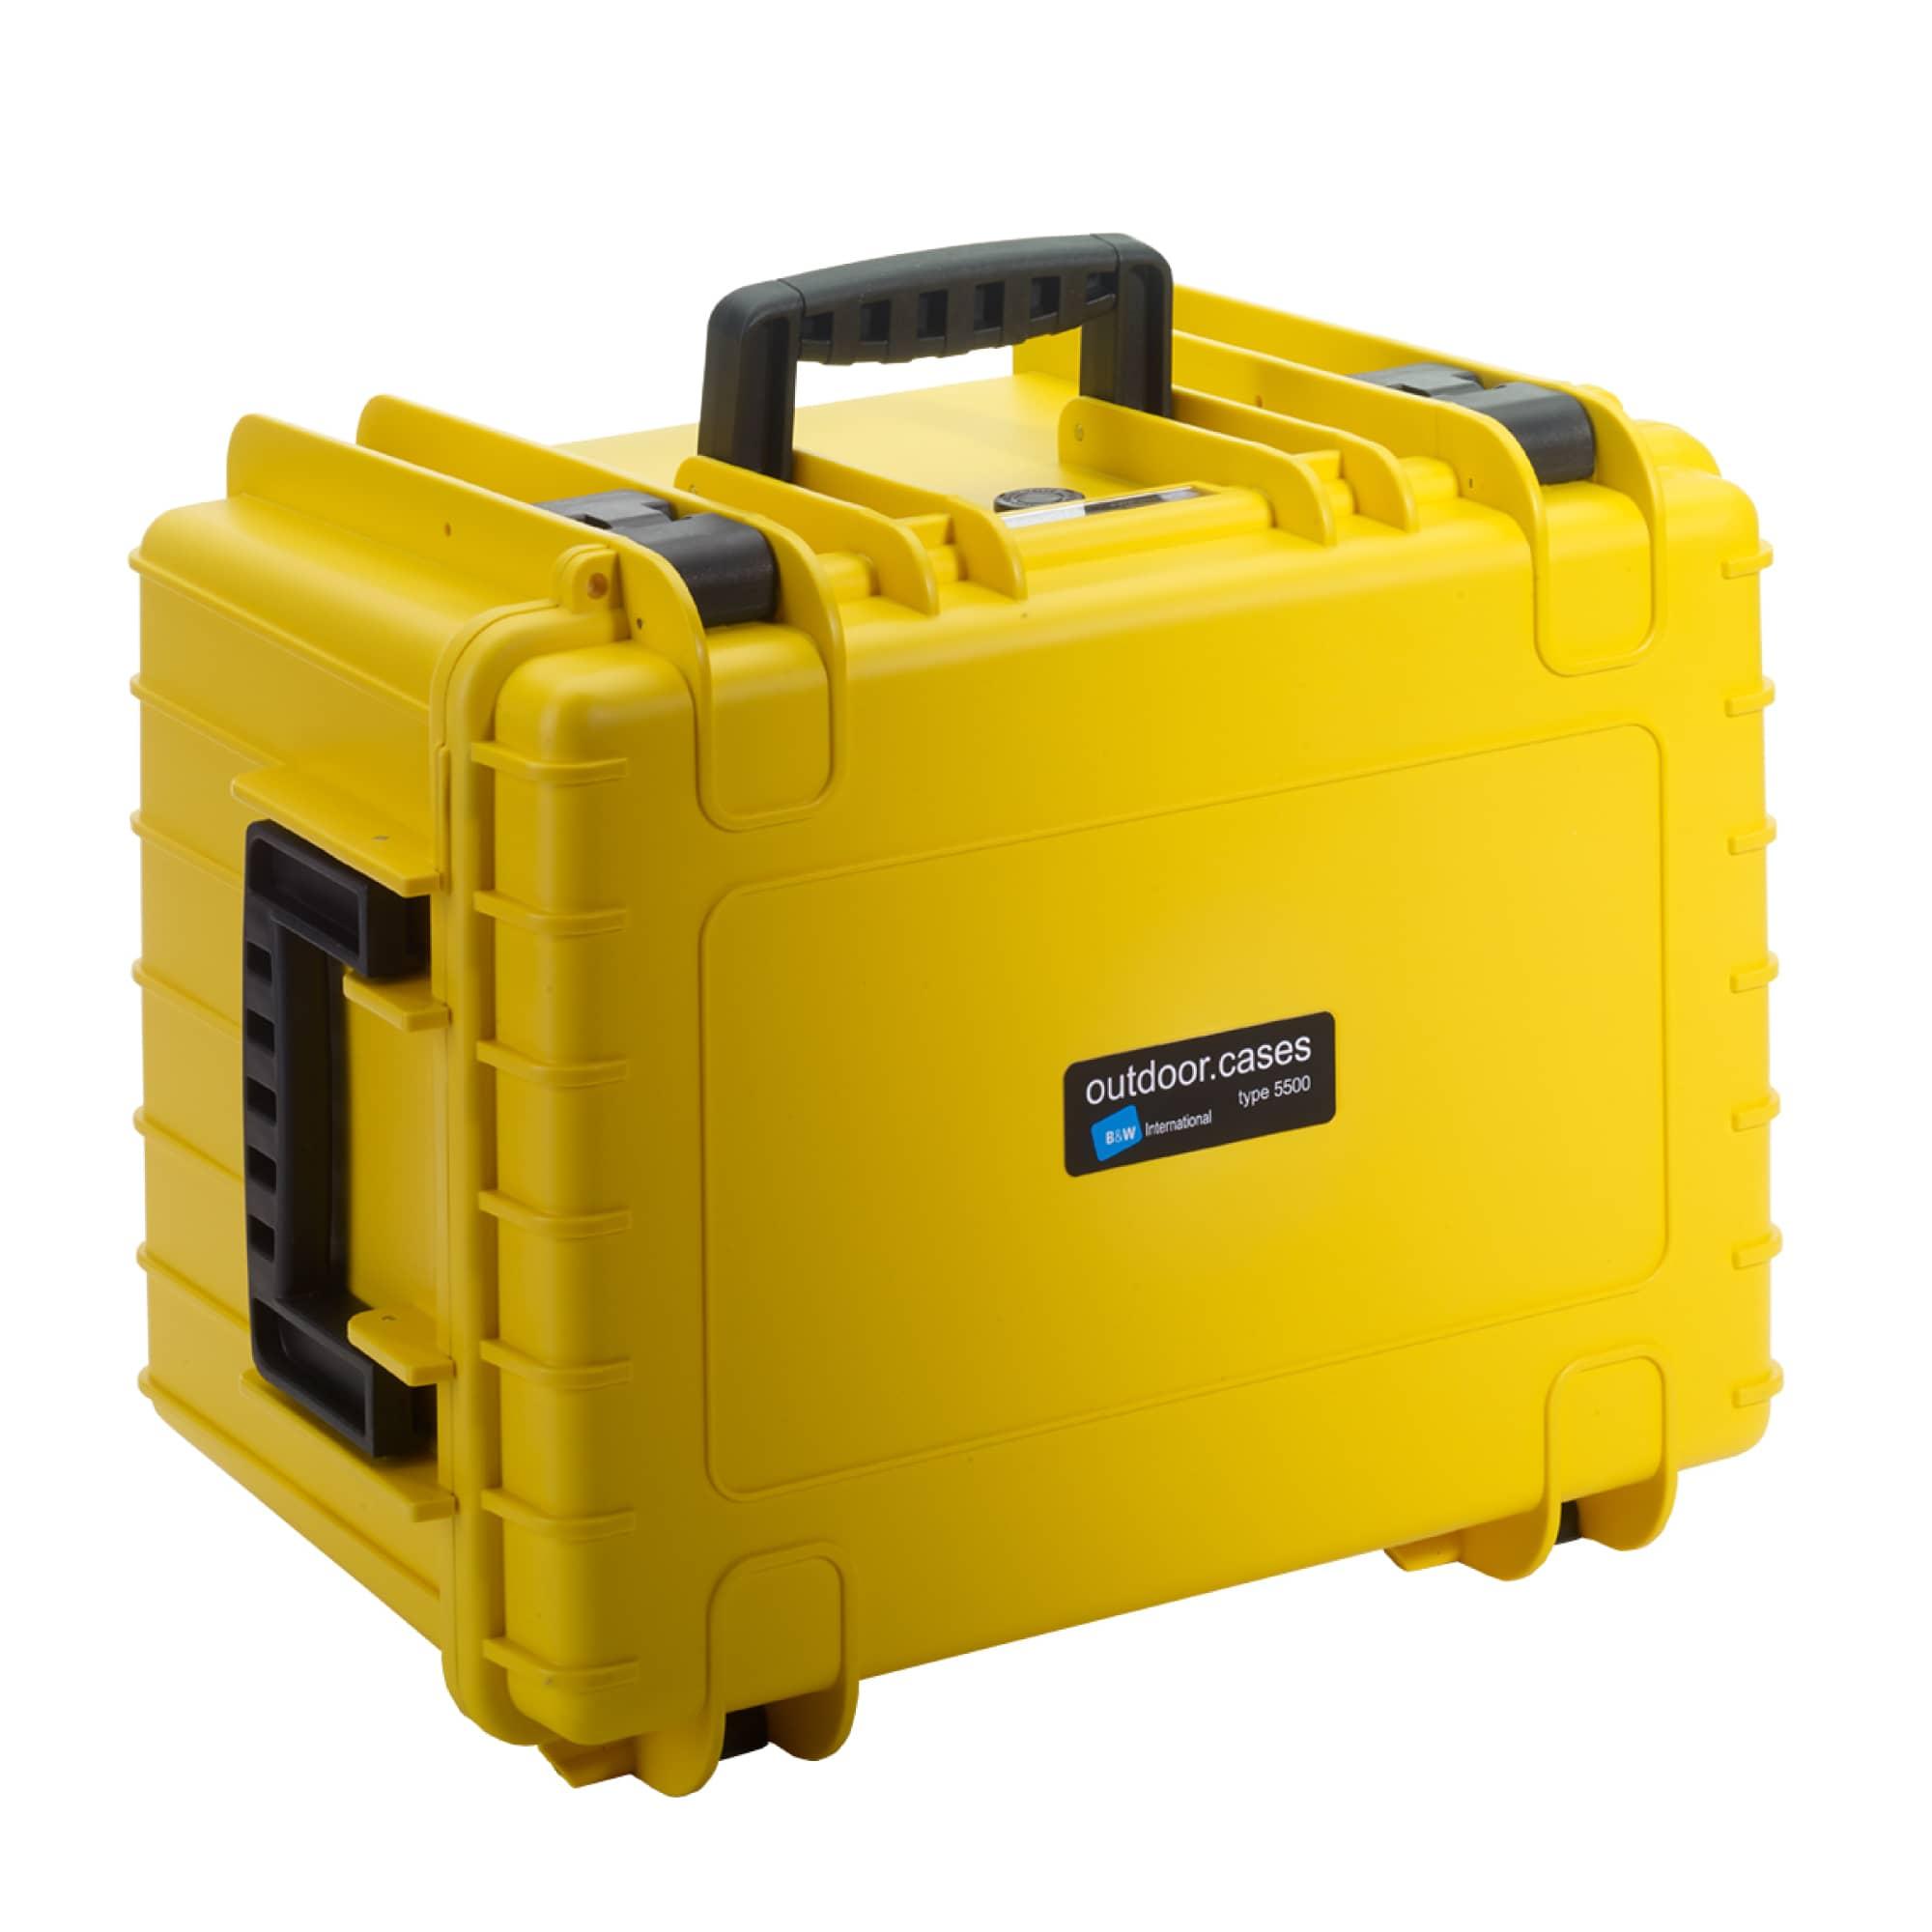 Outdoor Case Typ 5500